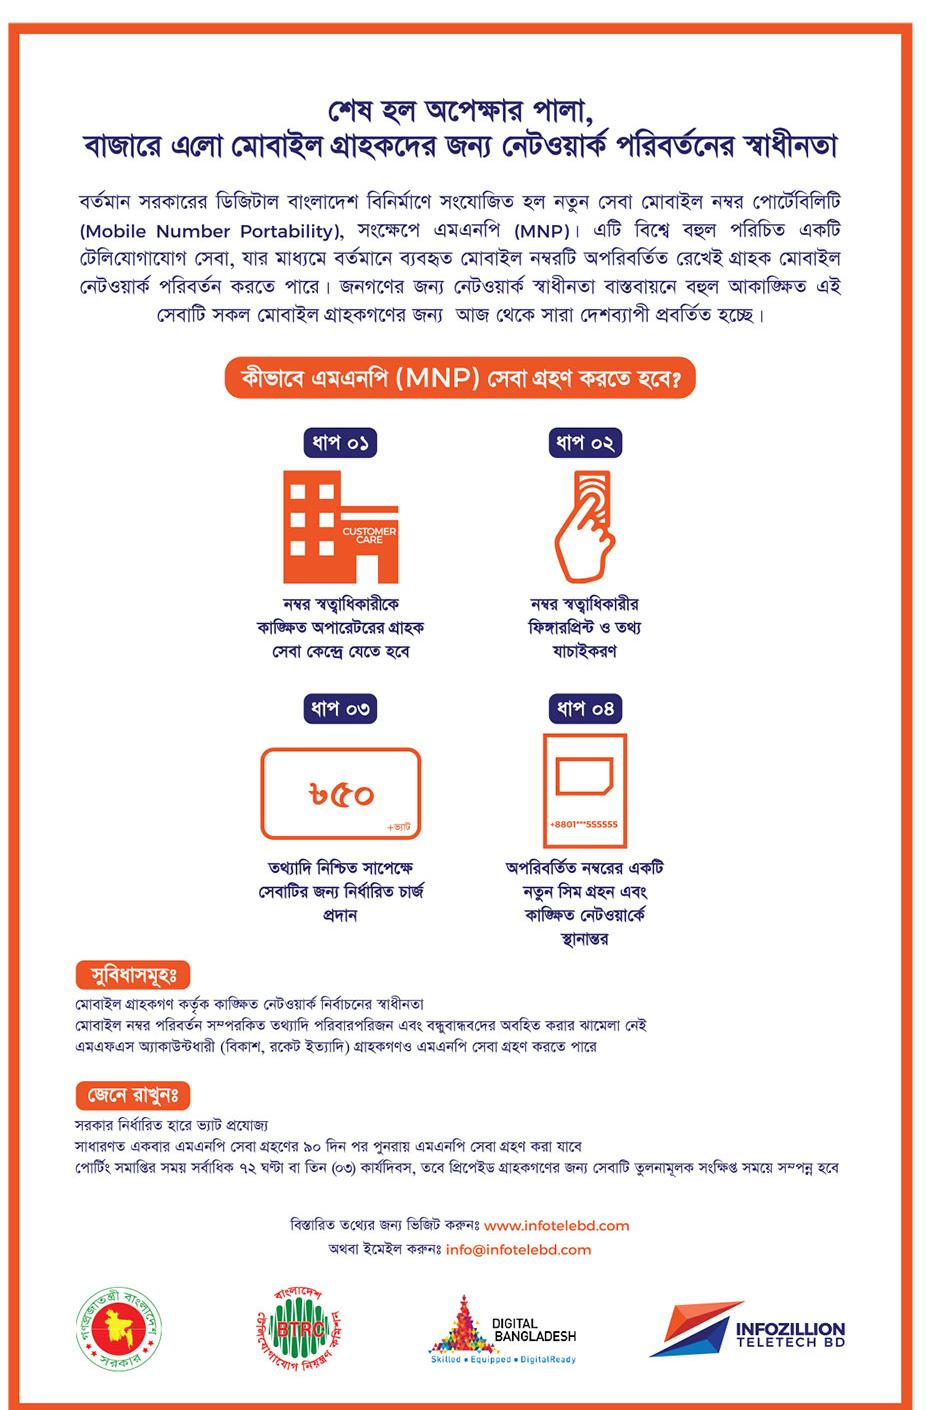 Mobile Number Portability), (MNP)D - Oct 01, বাংলাদেশ